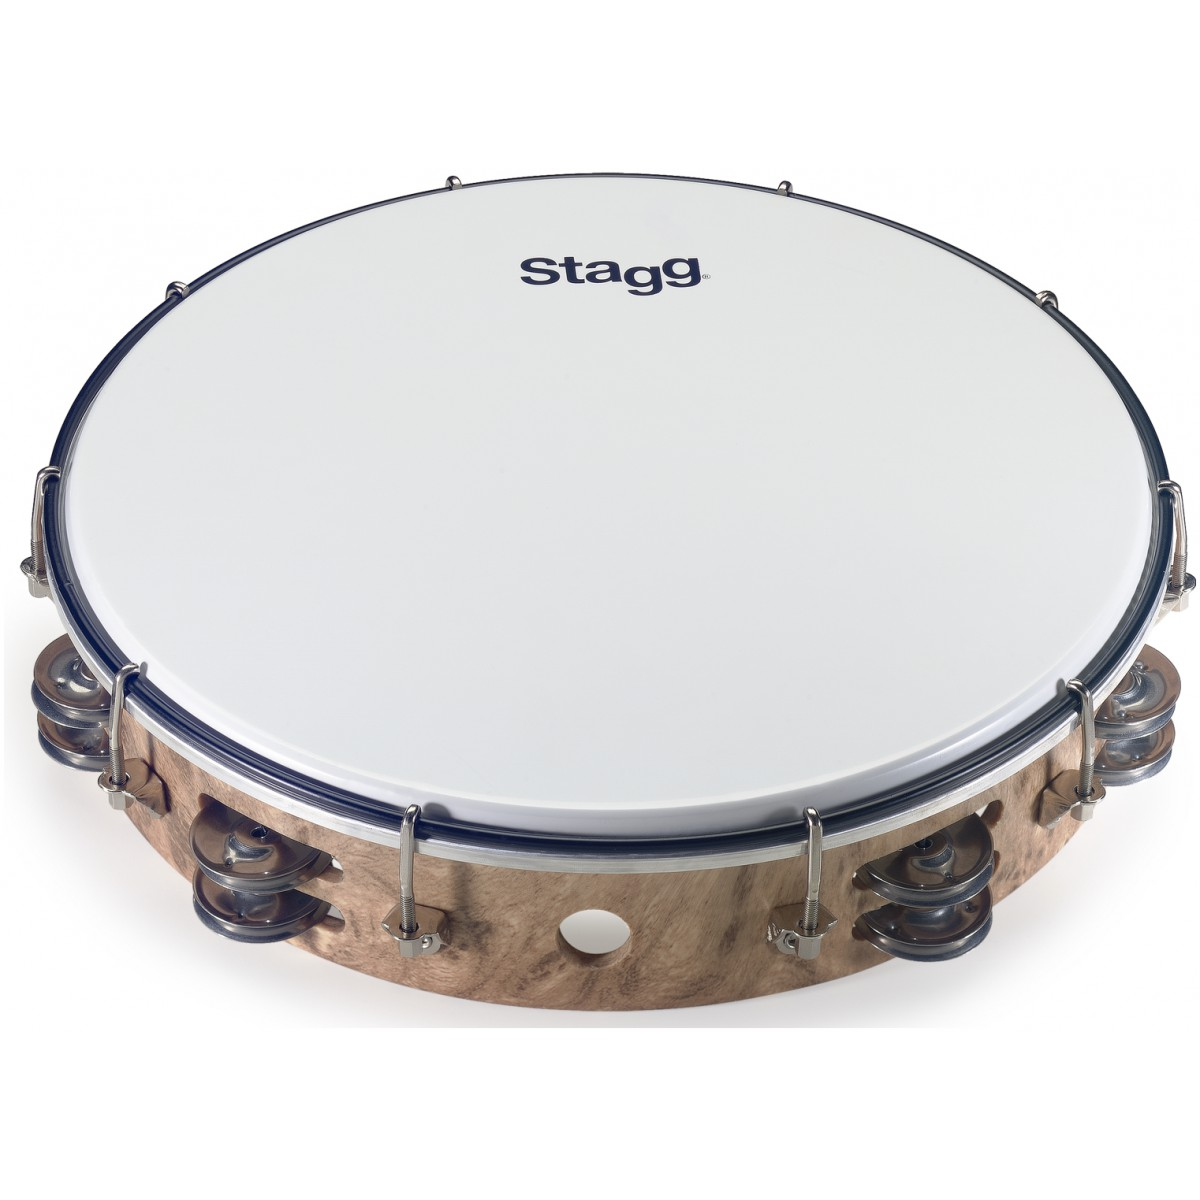 Stagg TAB-212P/WD, dvouřadá laditelná tamburína, 12